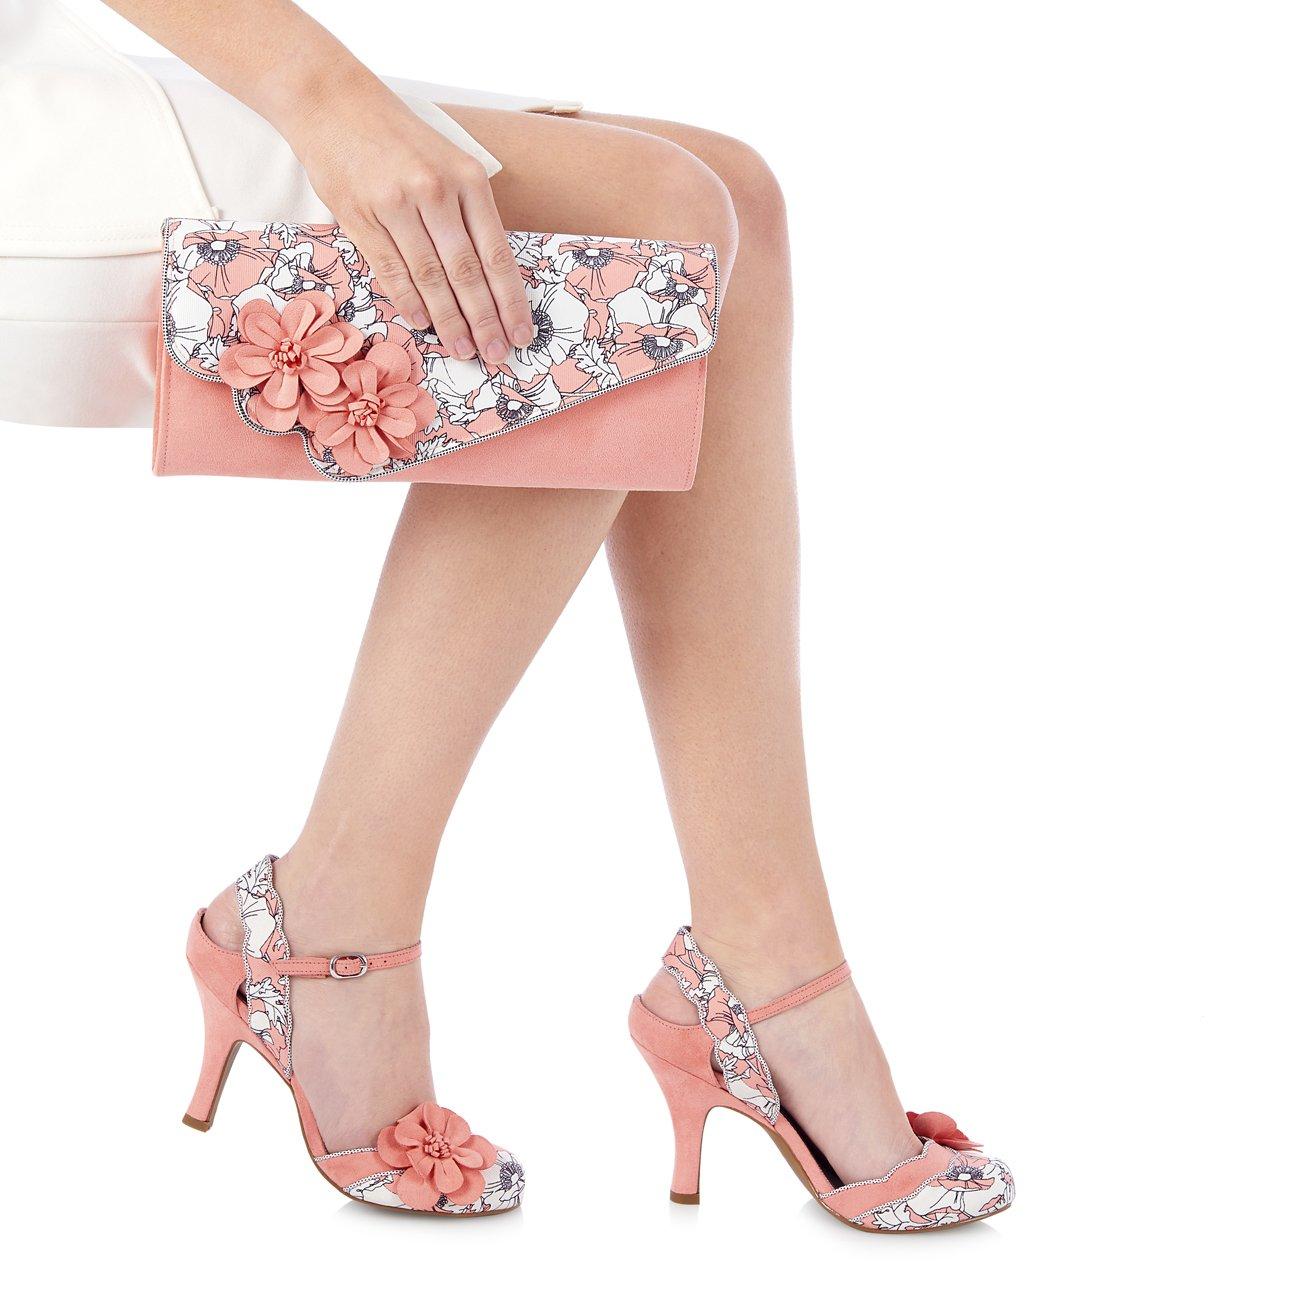 Ruby Shoo Women's Peach Floral Heidi Fabric Slingback Pumps & Rio Bag UK 5 EU 38 by Ruby Shoo (Image #5)